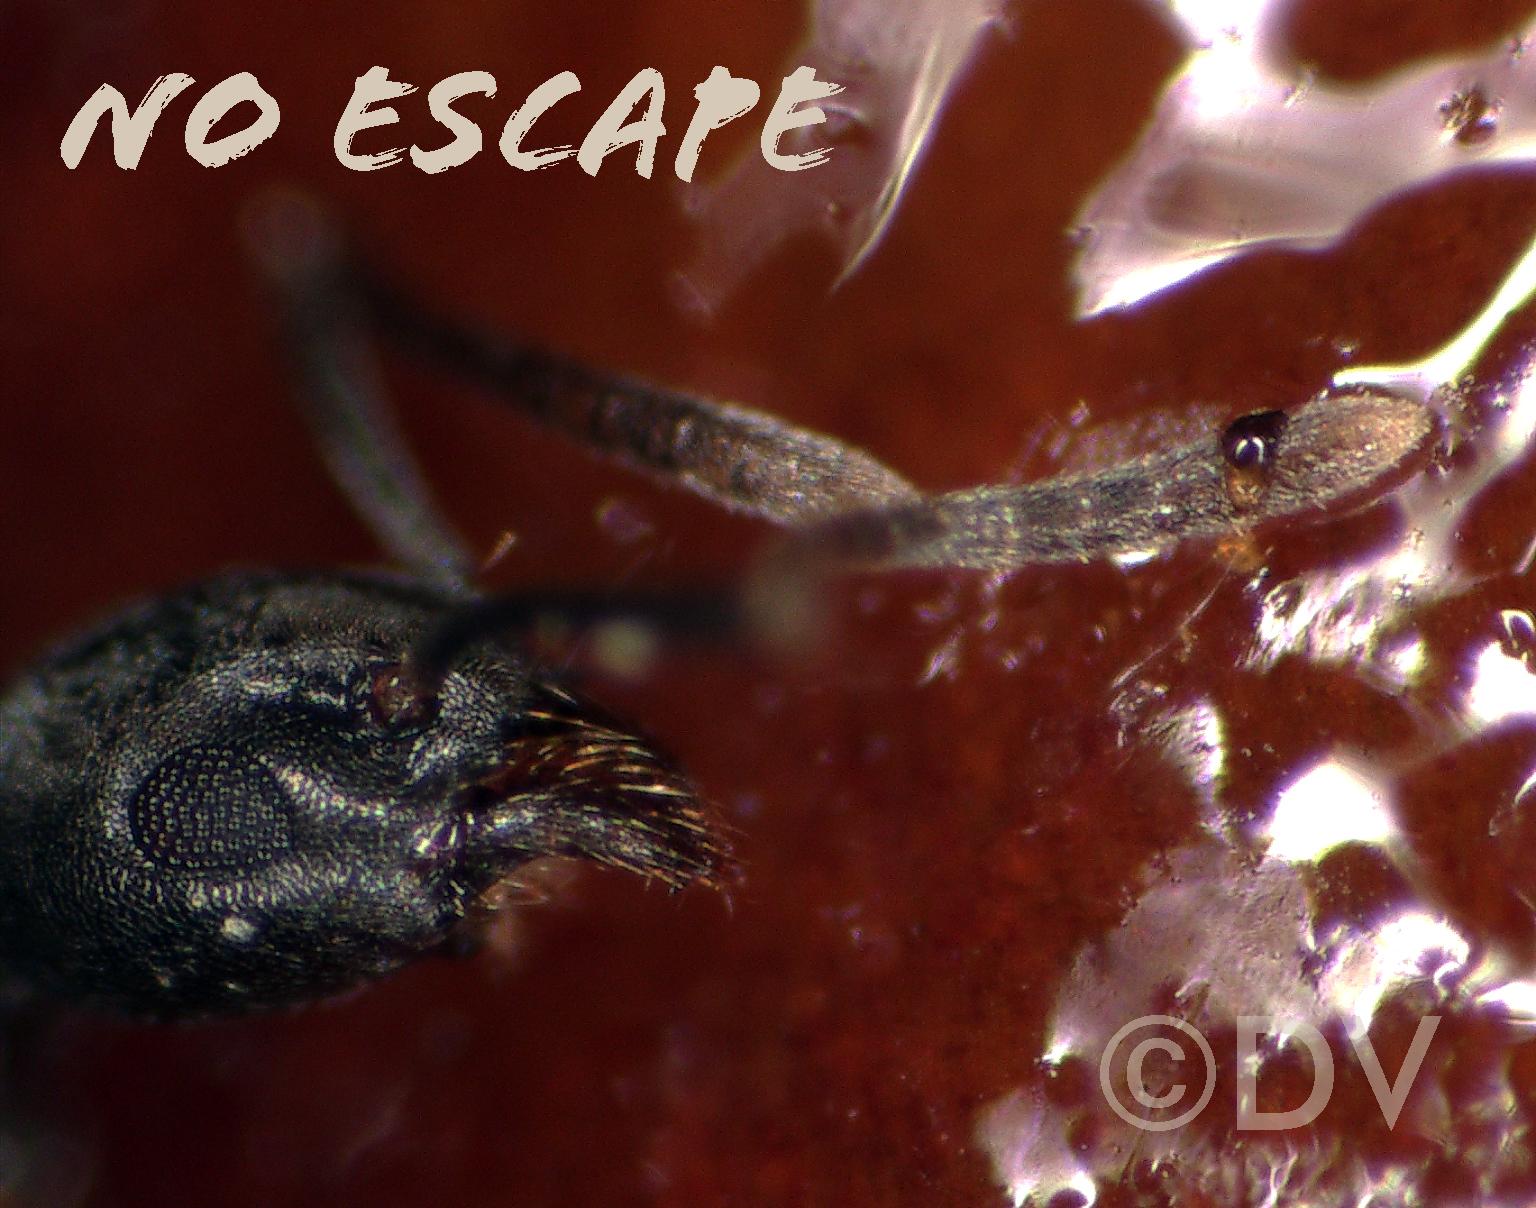 Arthropods stick to the horse-chestnut bud adhesive secretion. ©DV2020